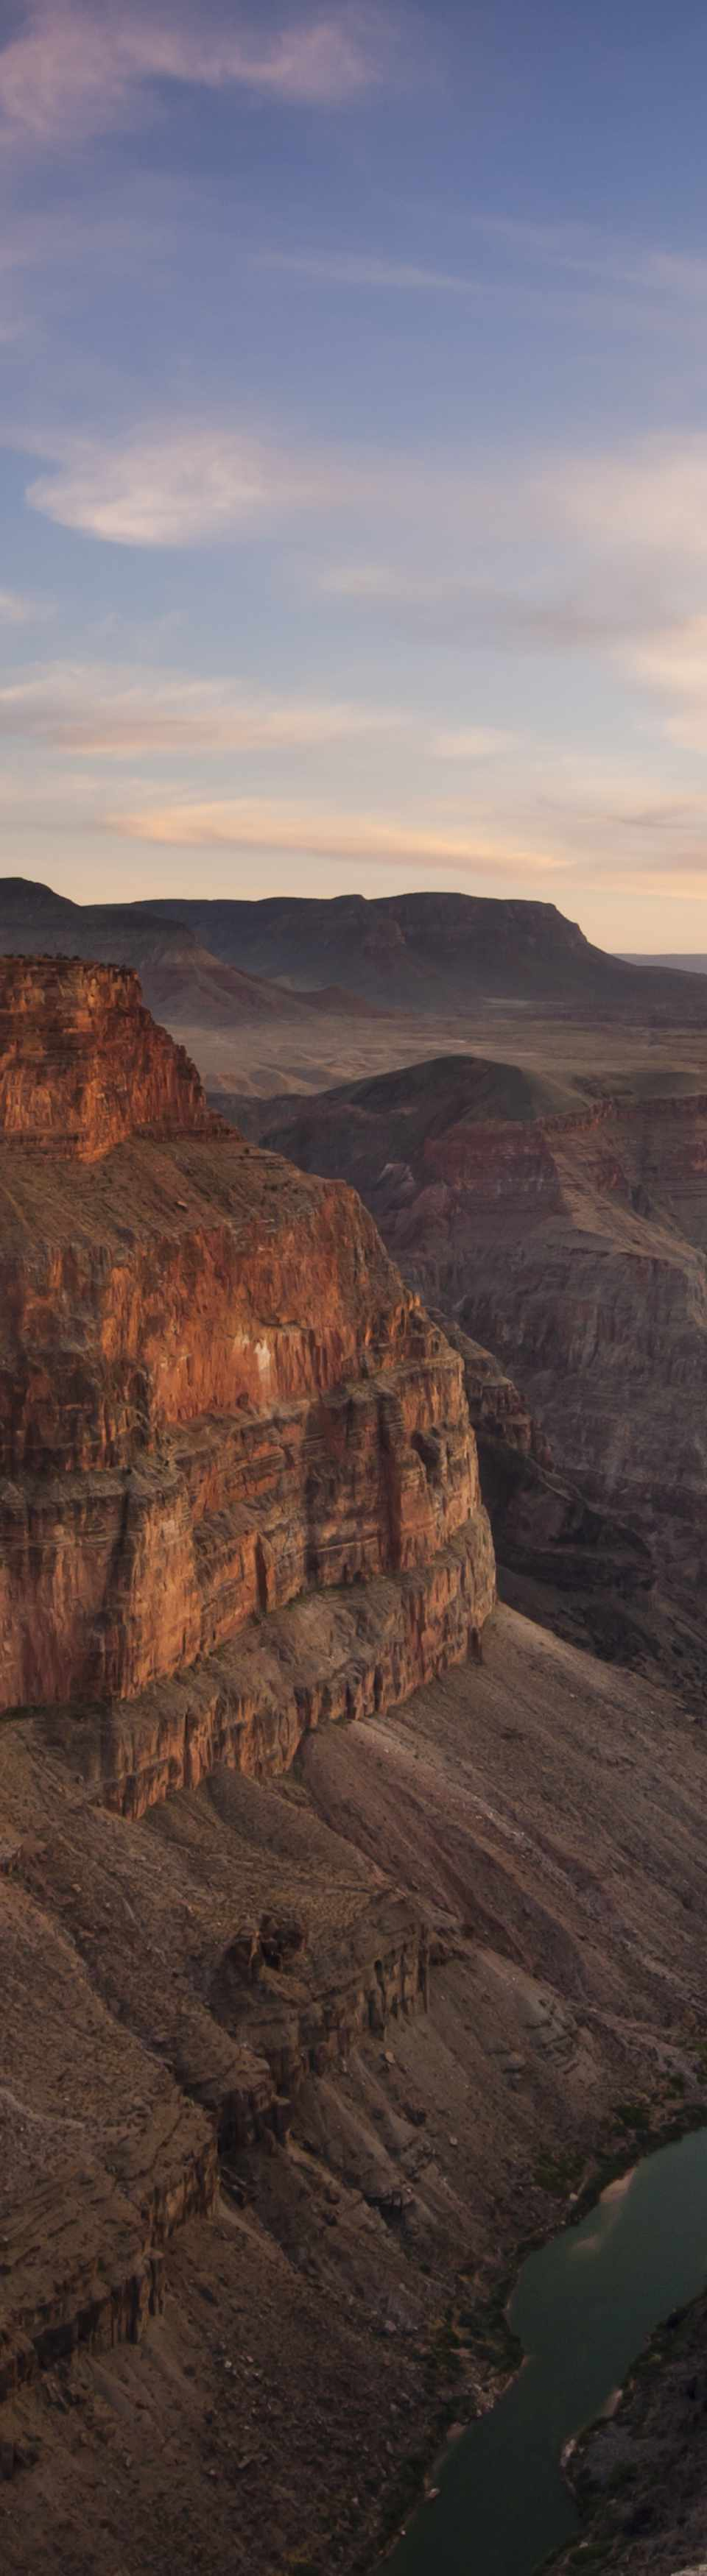 Toroweap Overlook, Grand Canyon, Arizona